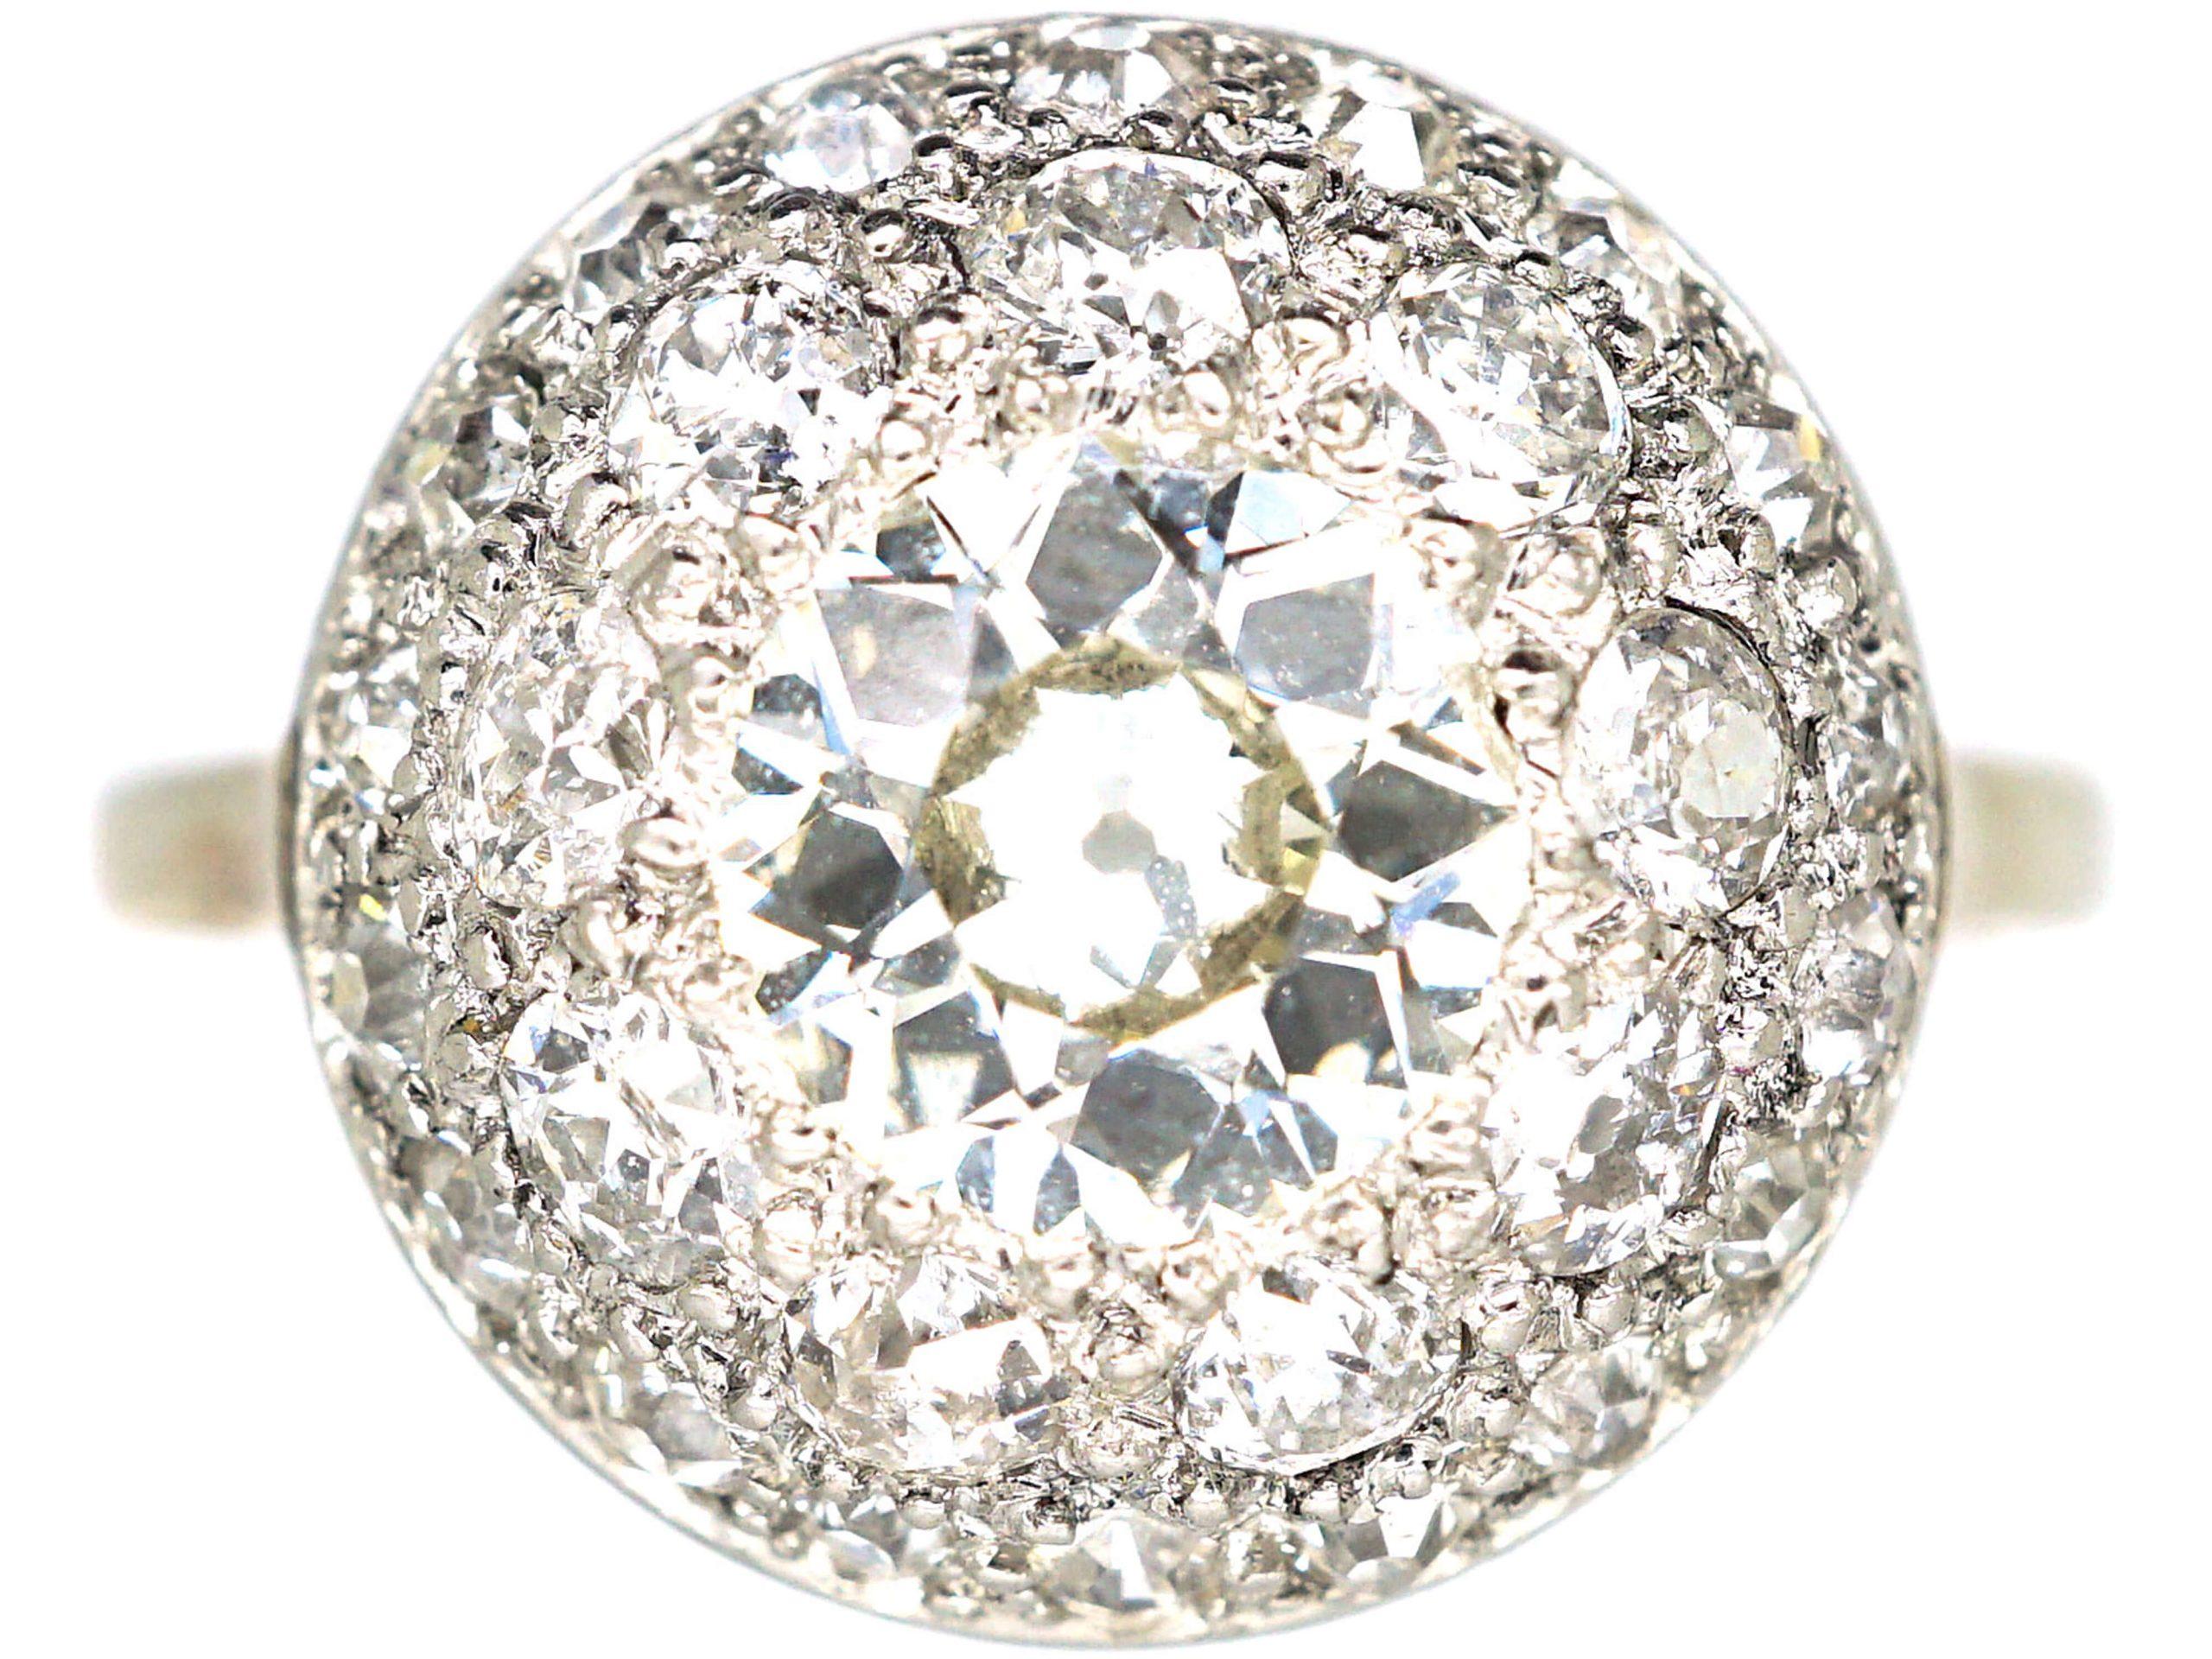 Art Deco 18ct White Gold & Platinum, Bombè Diamond Ring